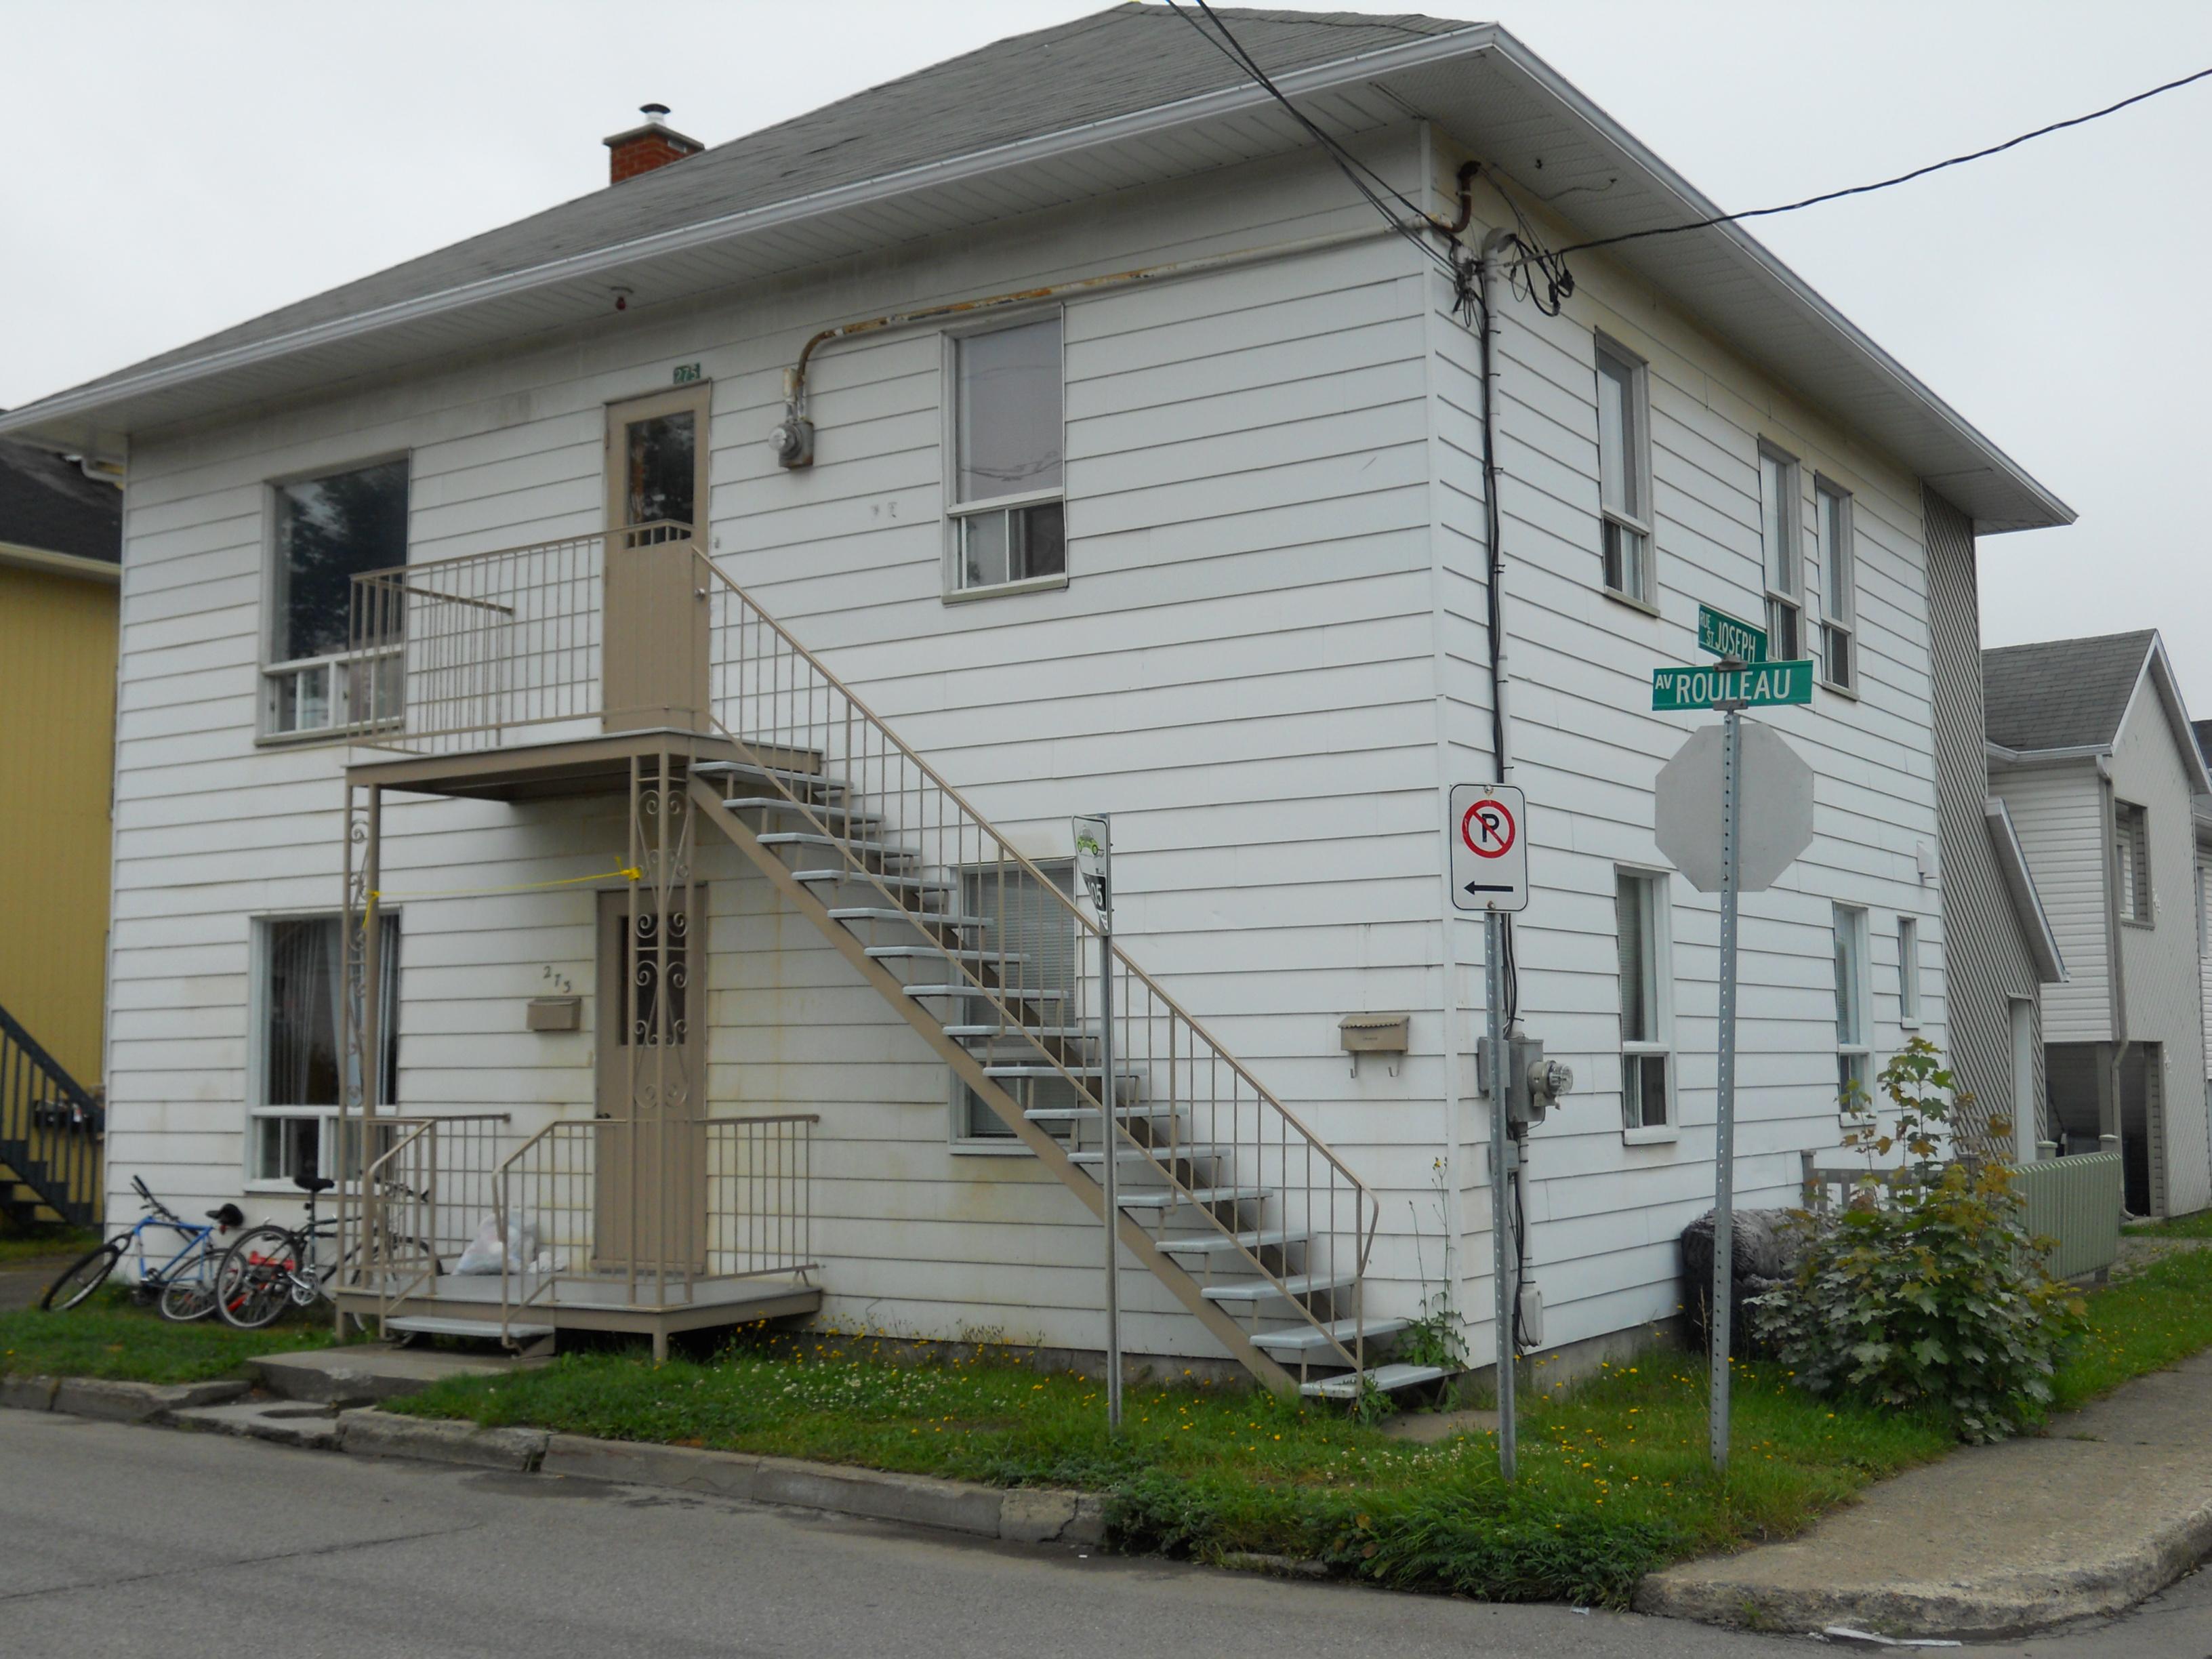 1217 - 273-275, avenue Rouleau